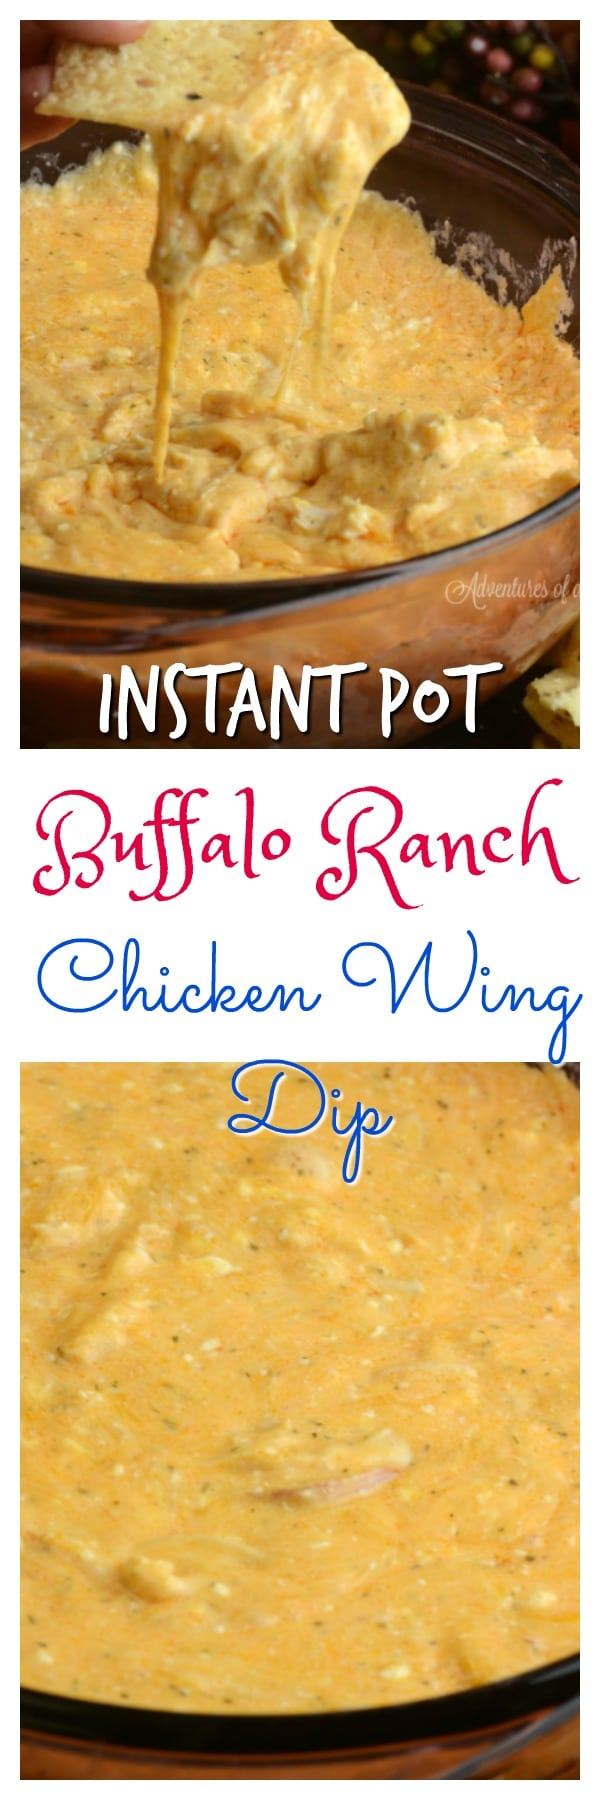 Buffalo Ranch chicken Wing Dip, Instant Pot Dip, Instant Pot Chicken Wing Dip